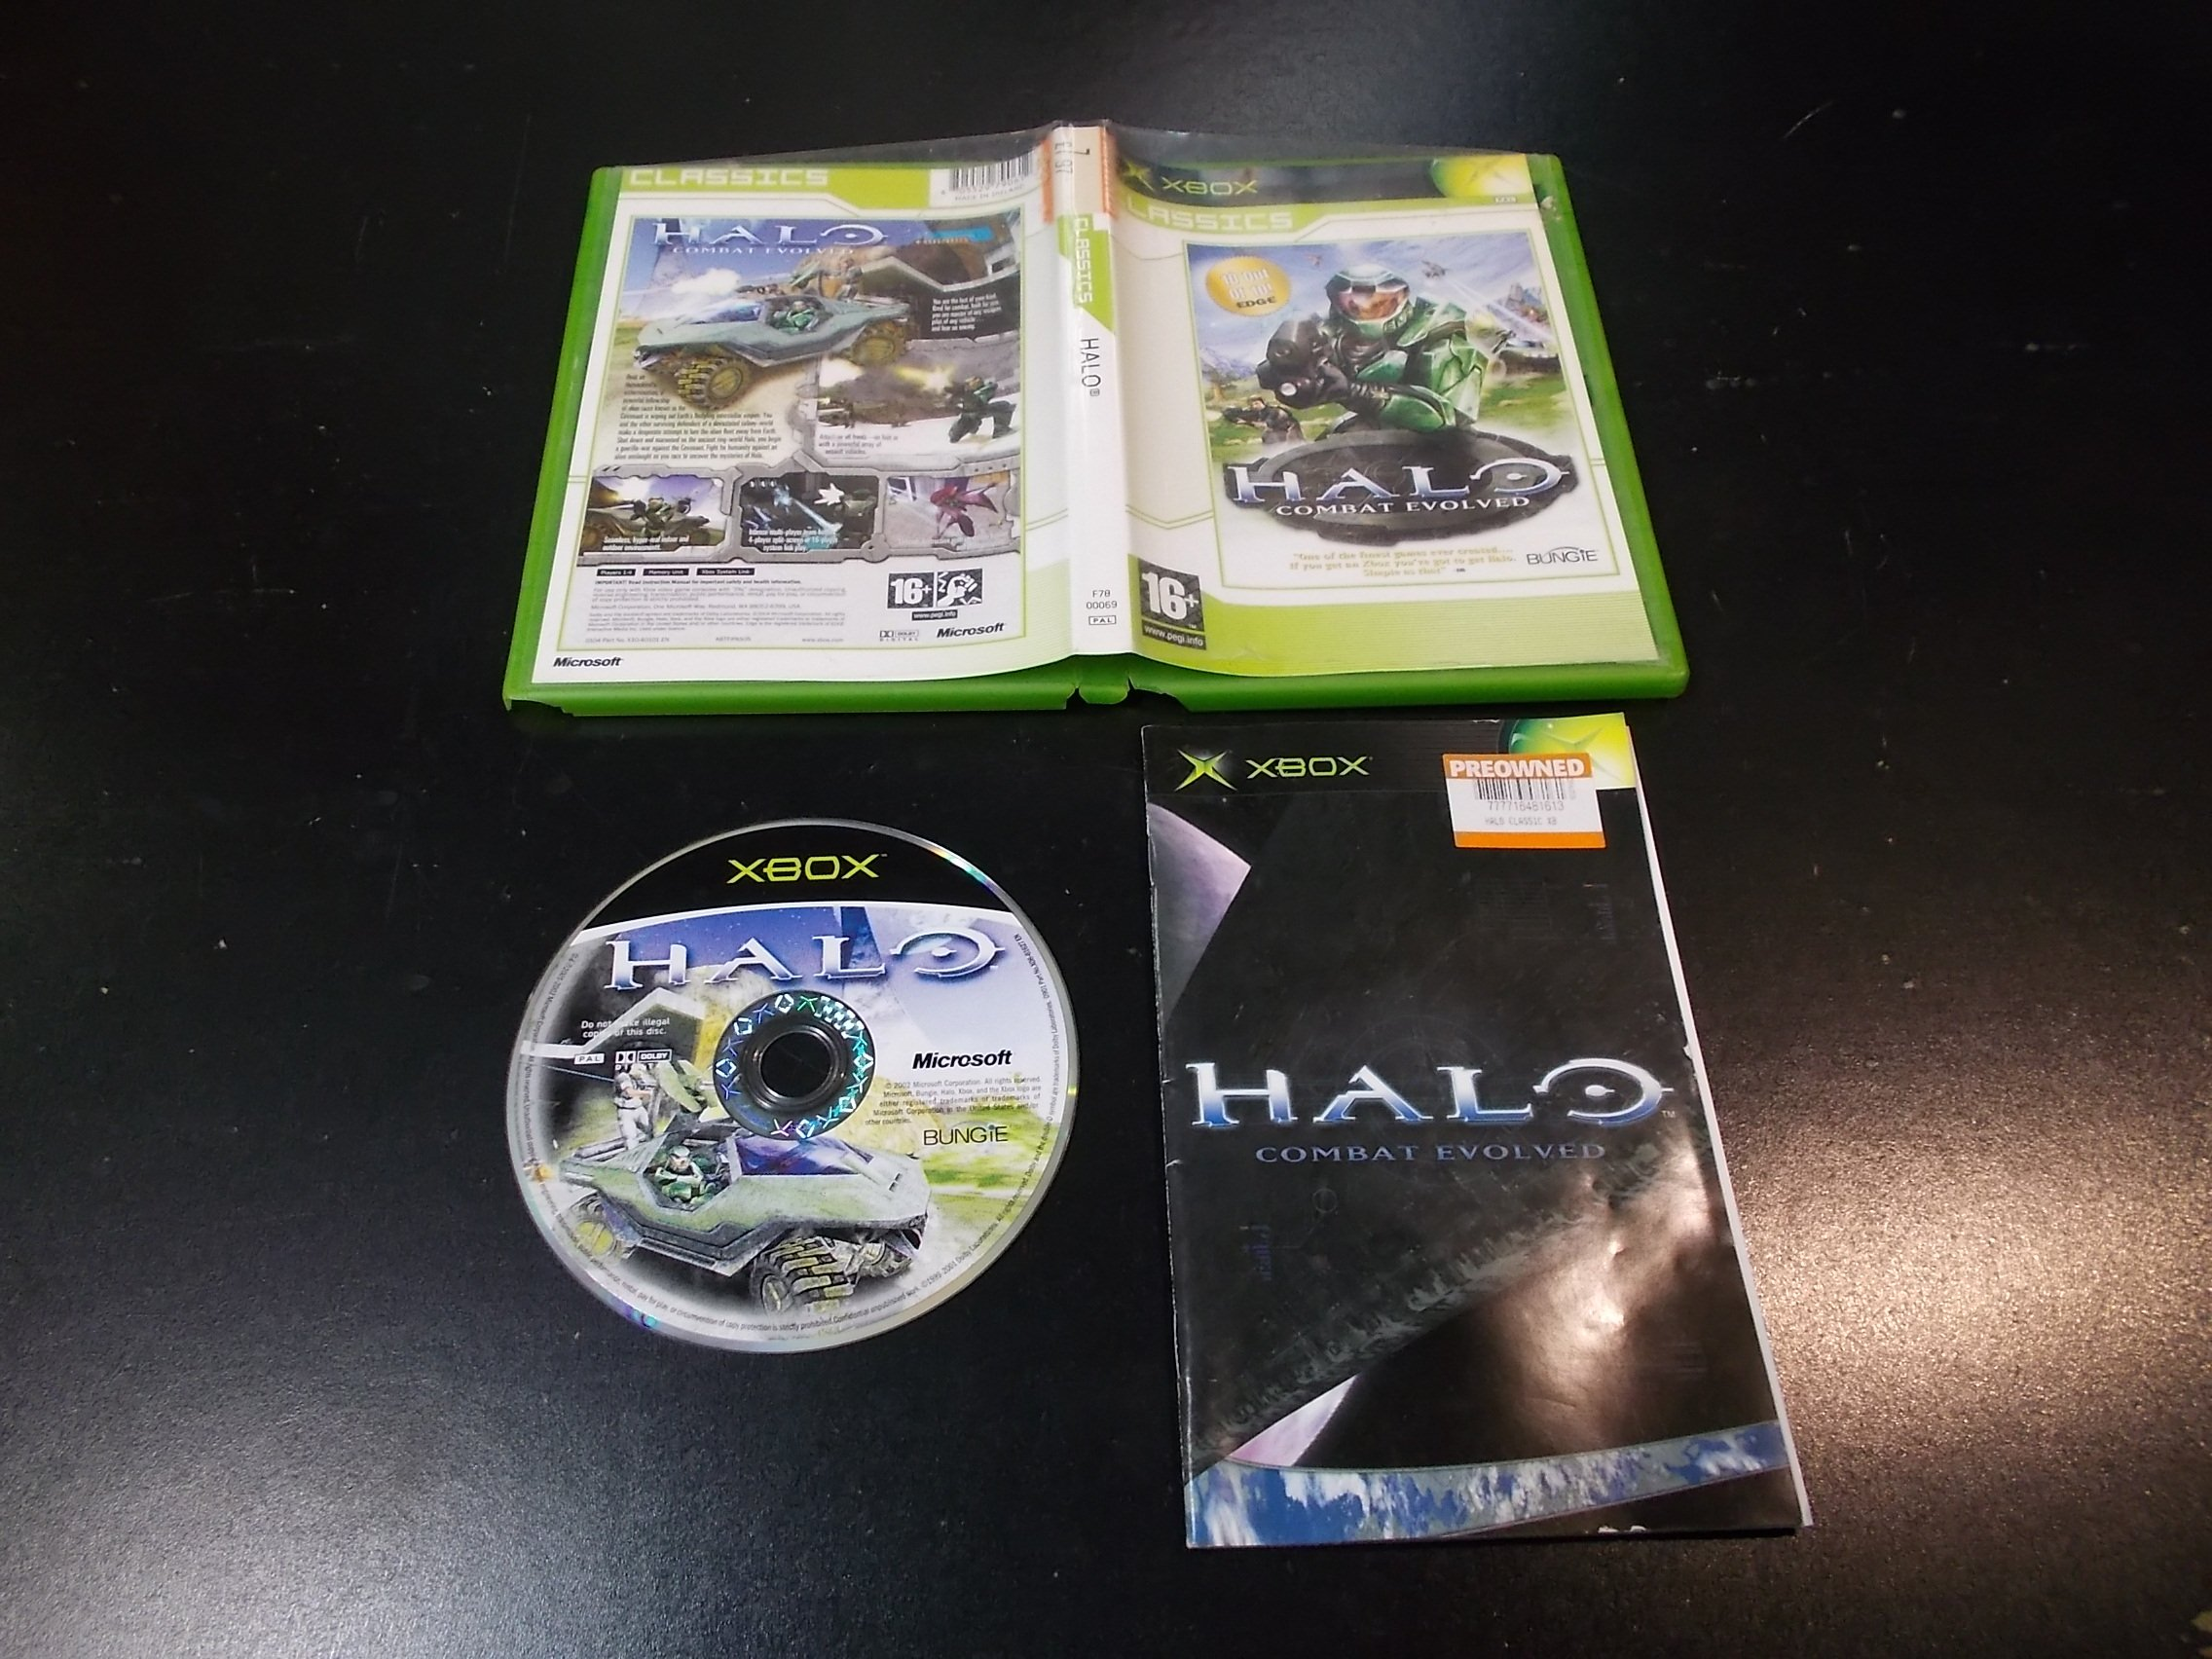 HALO COMBAT EVOLVED - GRA Xbox Classic